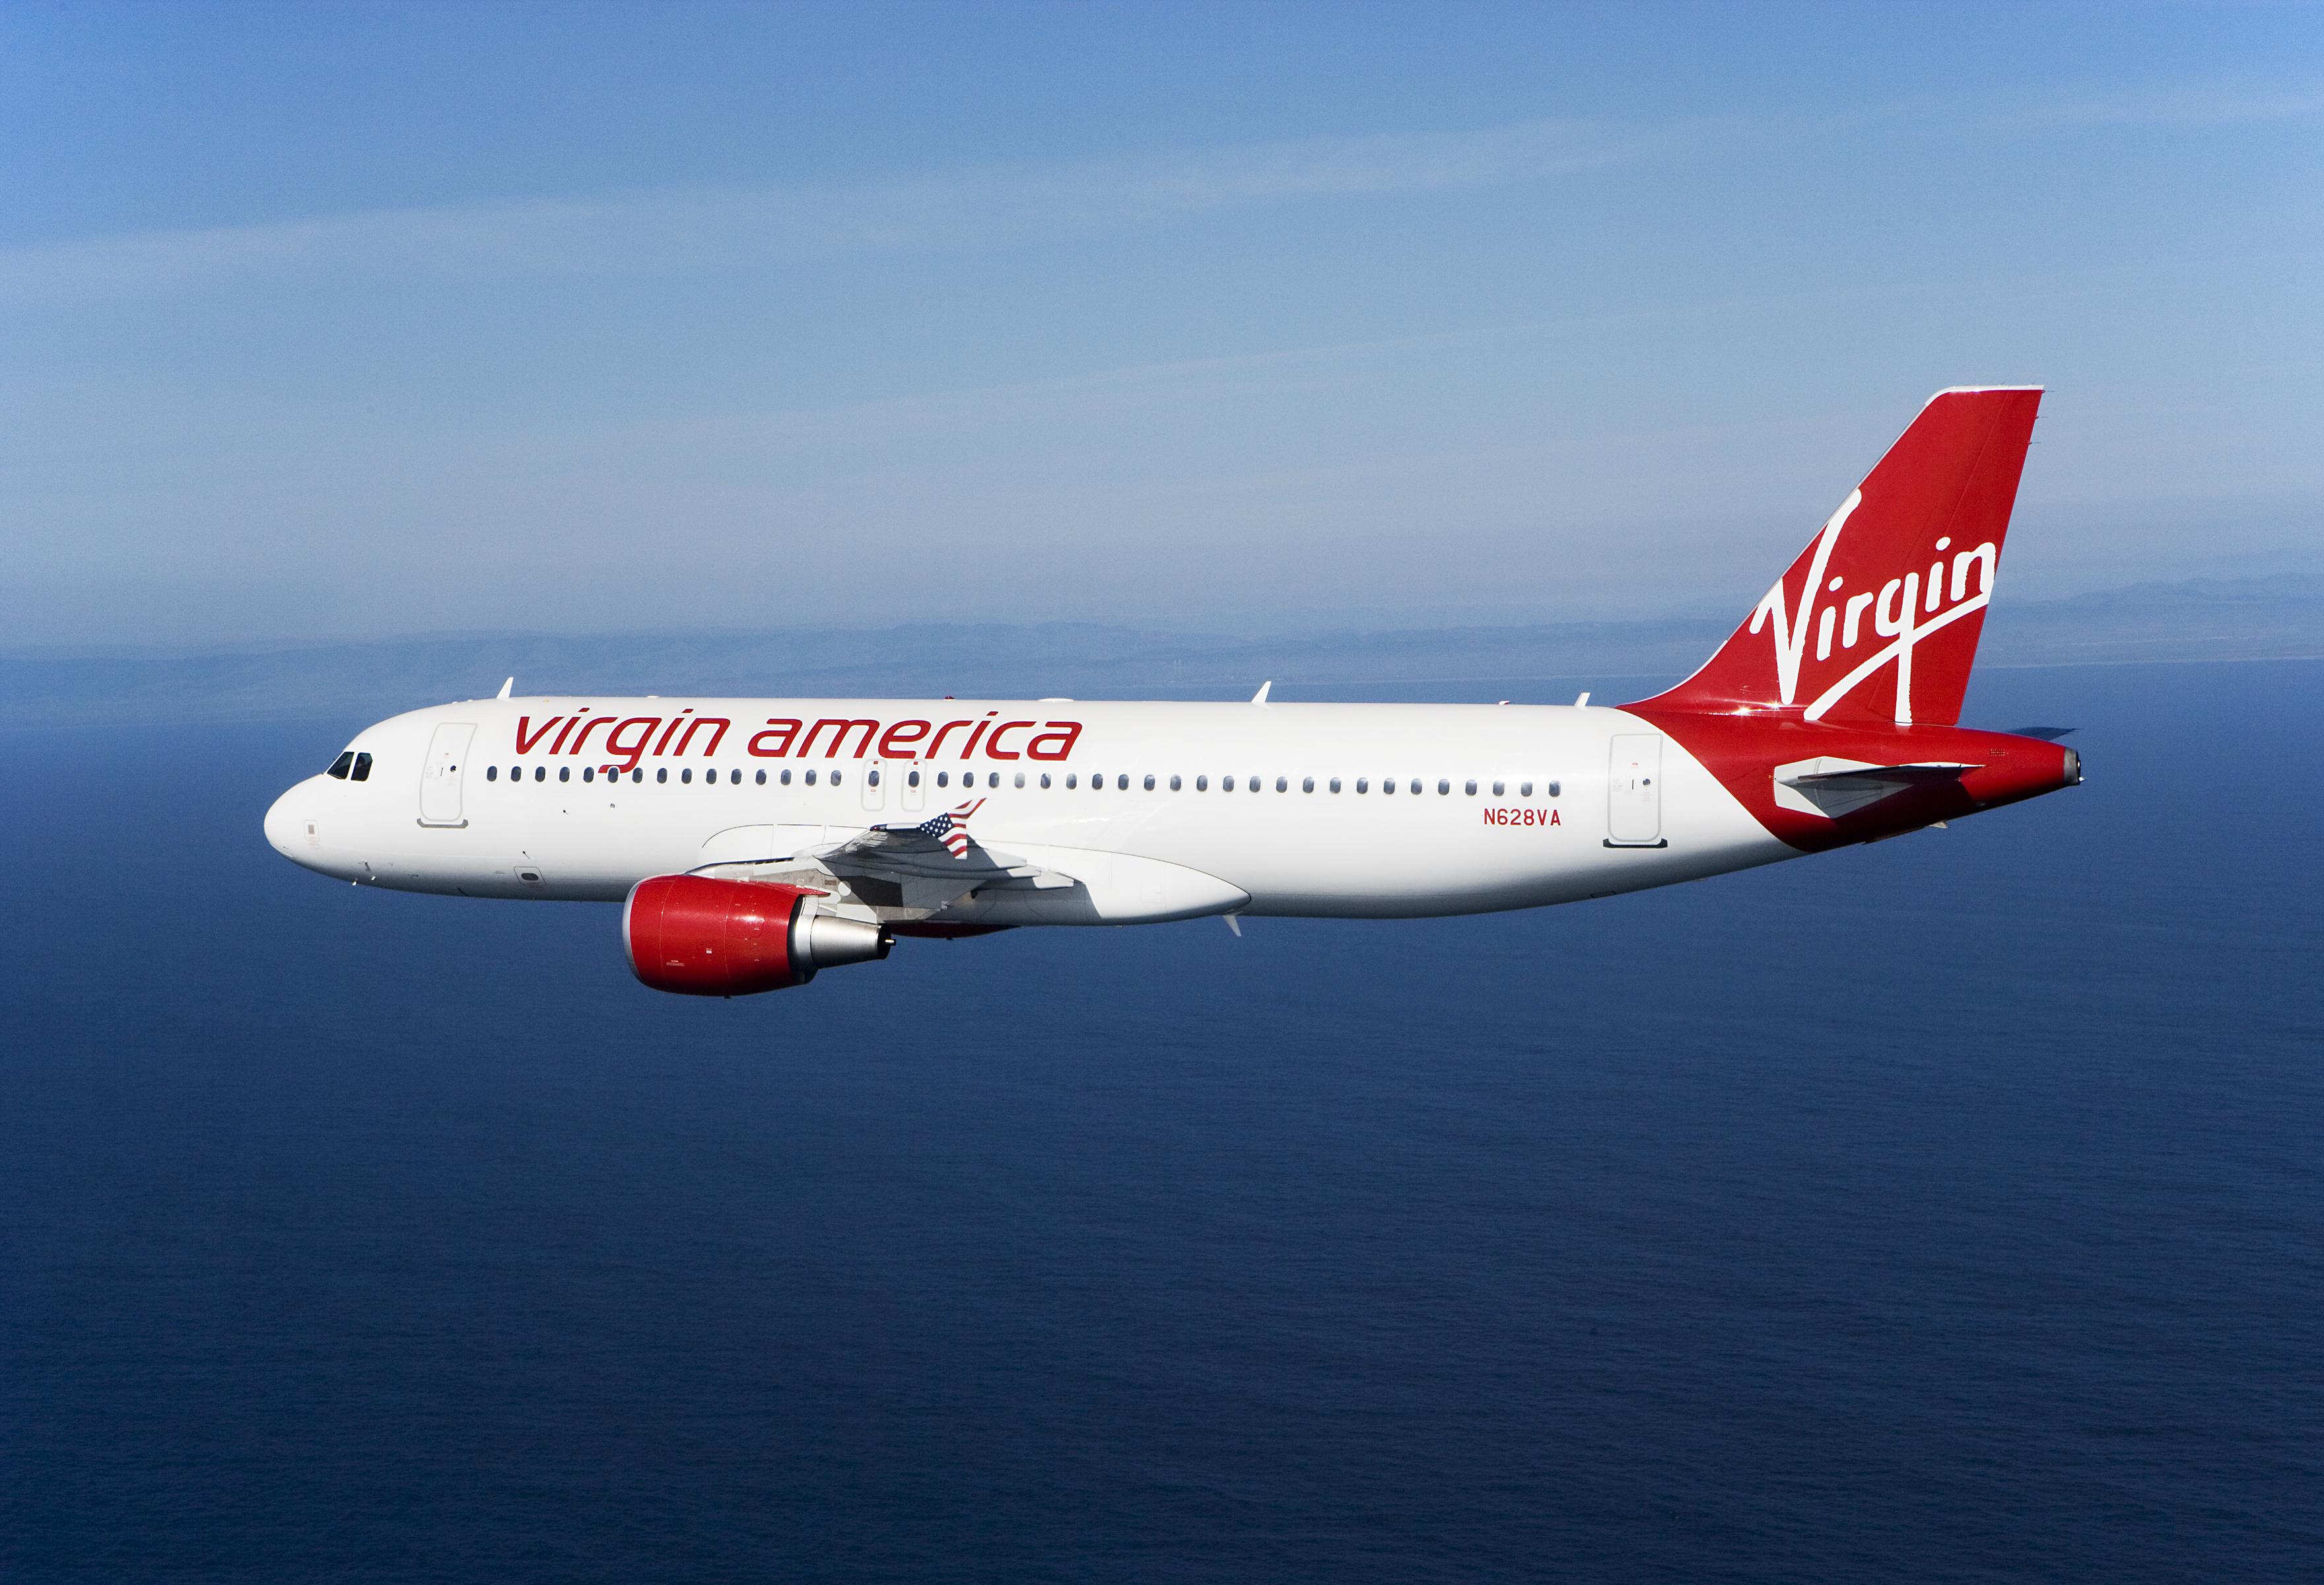 A Virgin America plane